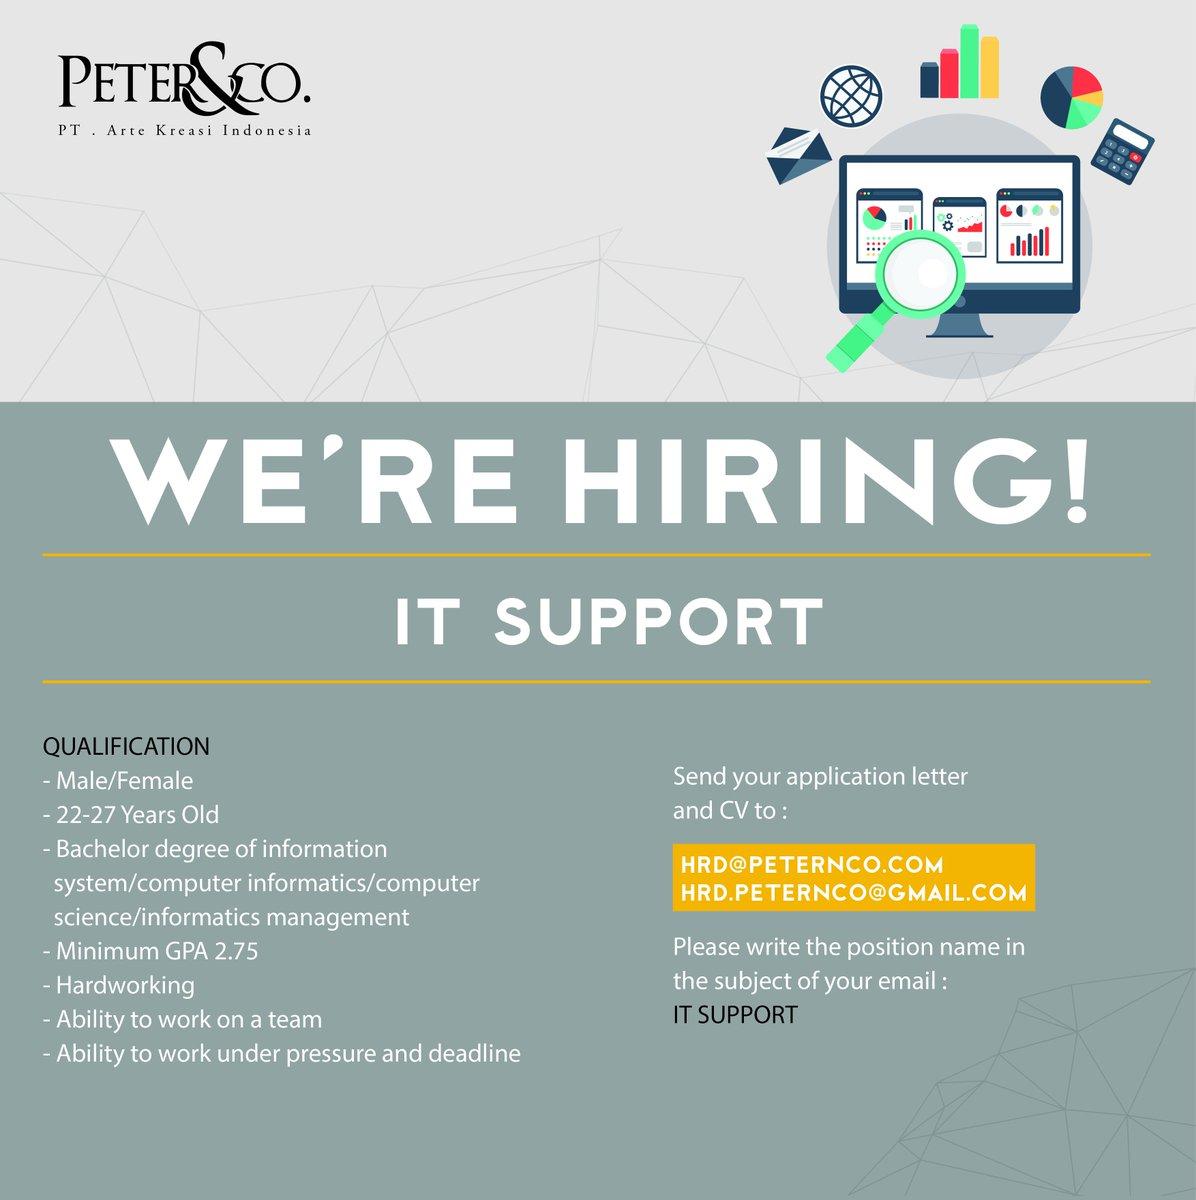 Yola Anggraeni On Twitter We Re Hiring It Support Peternco